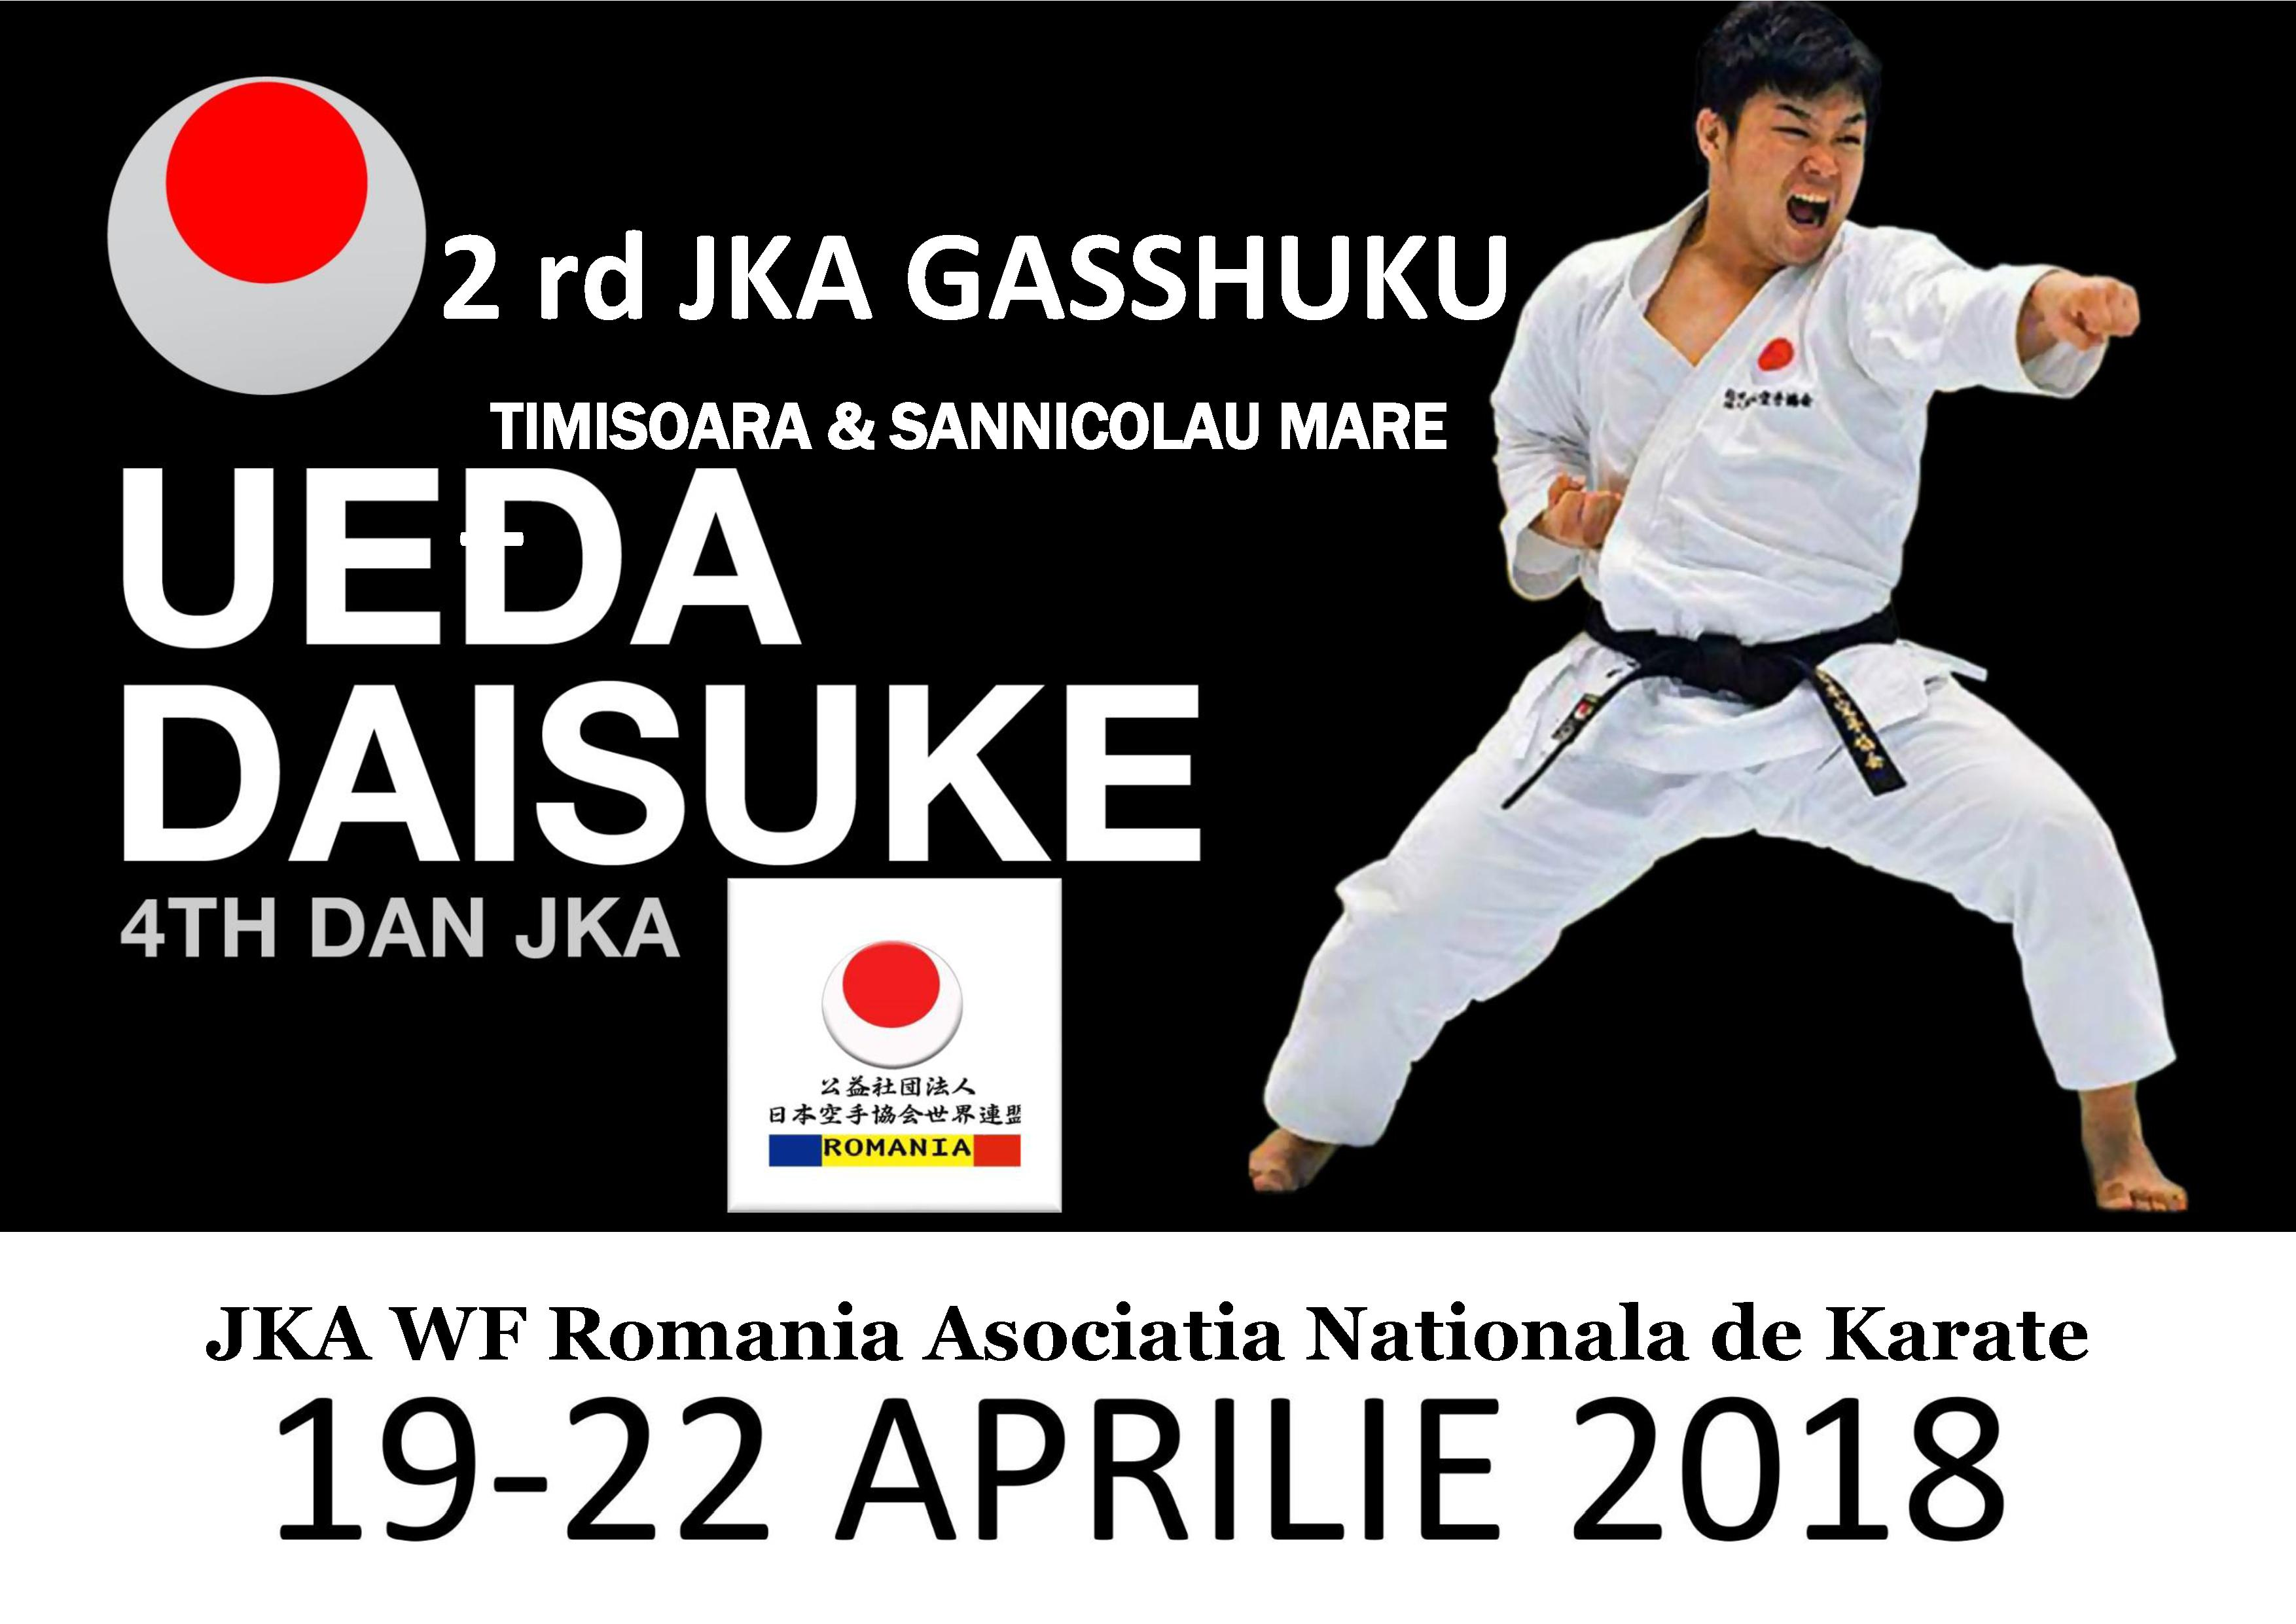 2 rd JKA GASSHUKU 2018-Ueda Daisuke Sensei-Timisoara&Sannicolau Mare